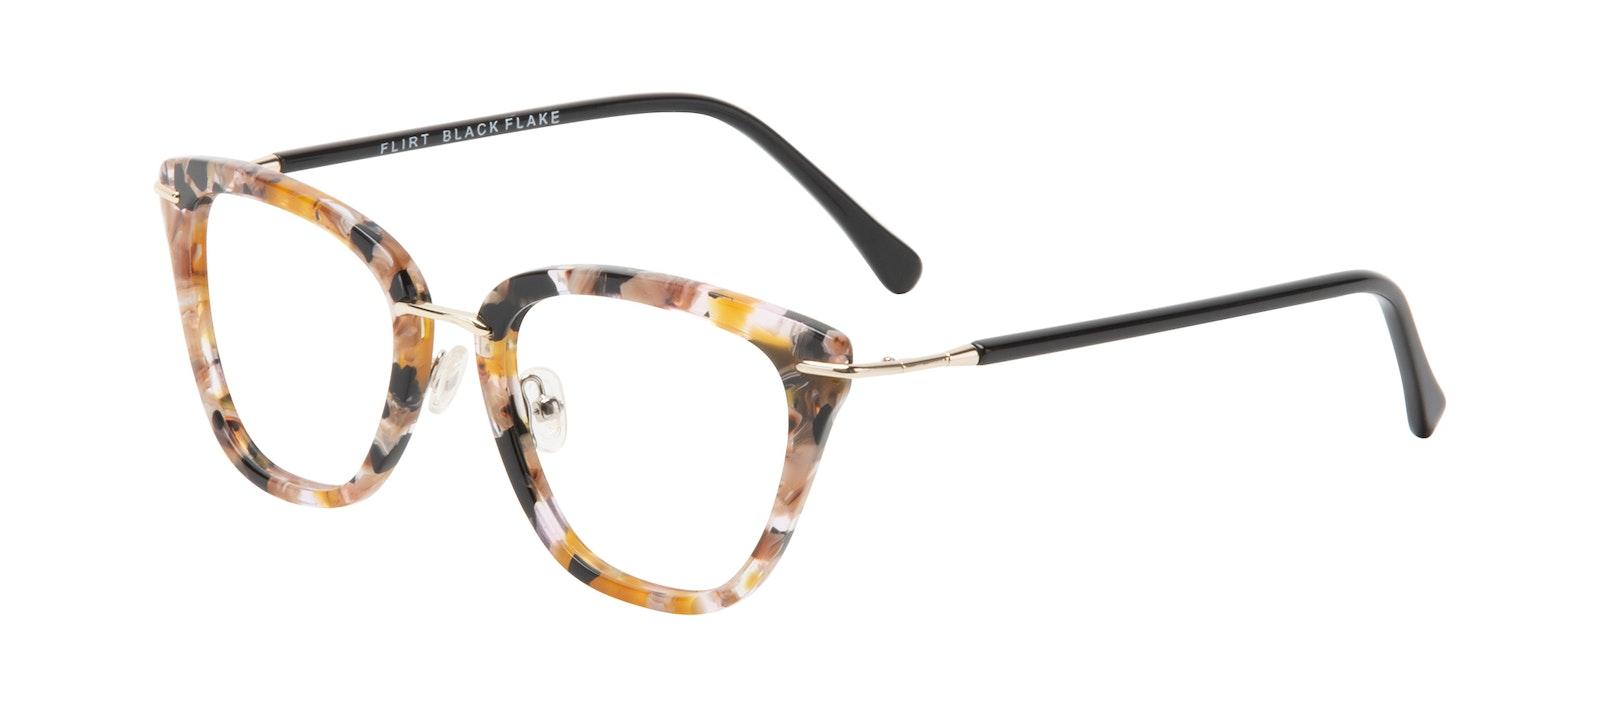 Affordable Fashion Glasses Square Eyeglasses Women Flirt Black Flake Tilt